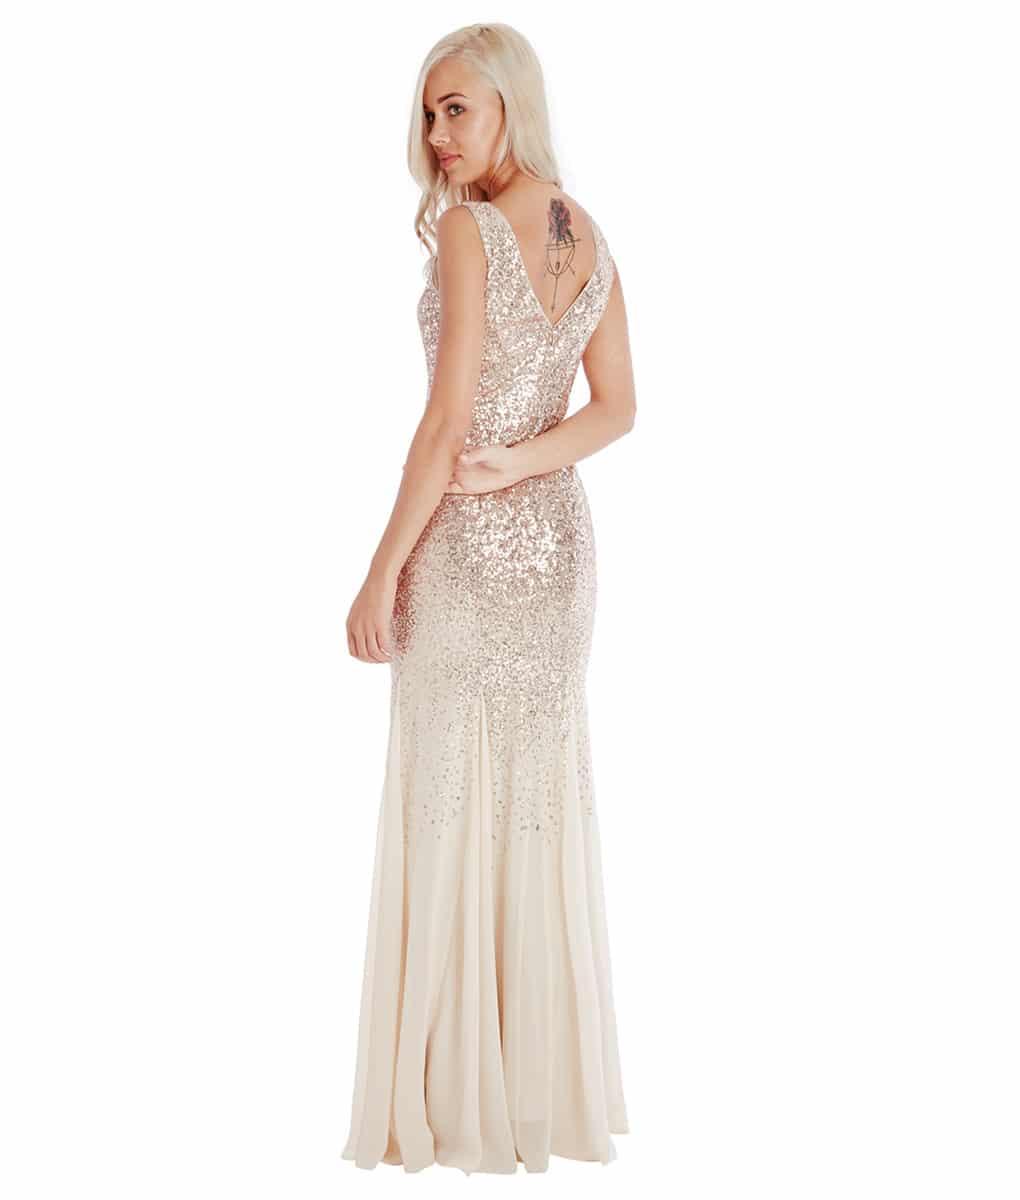 Alila-Champagne-v-neck-sequin-debs-dress-City-Goddess